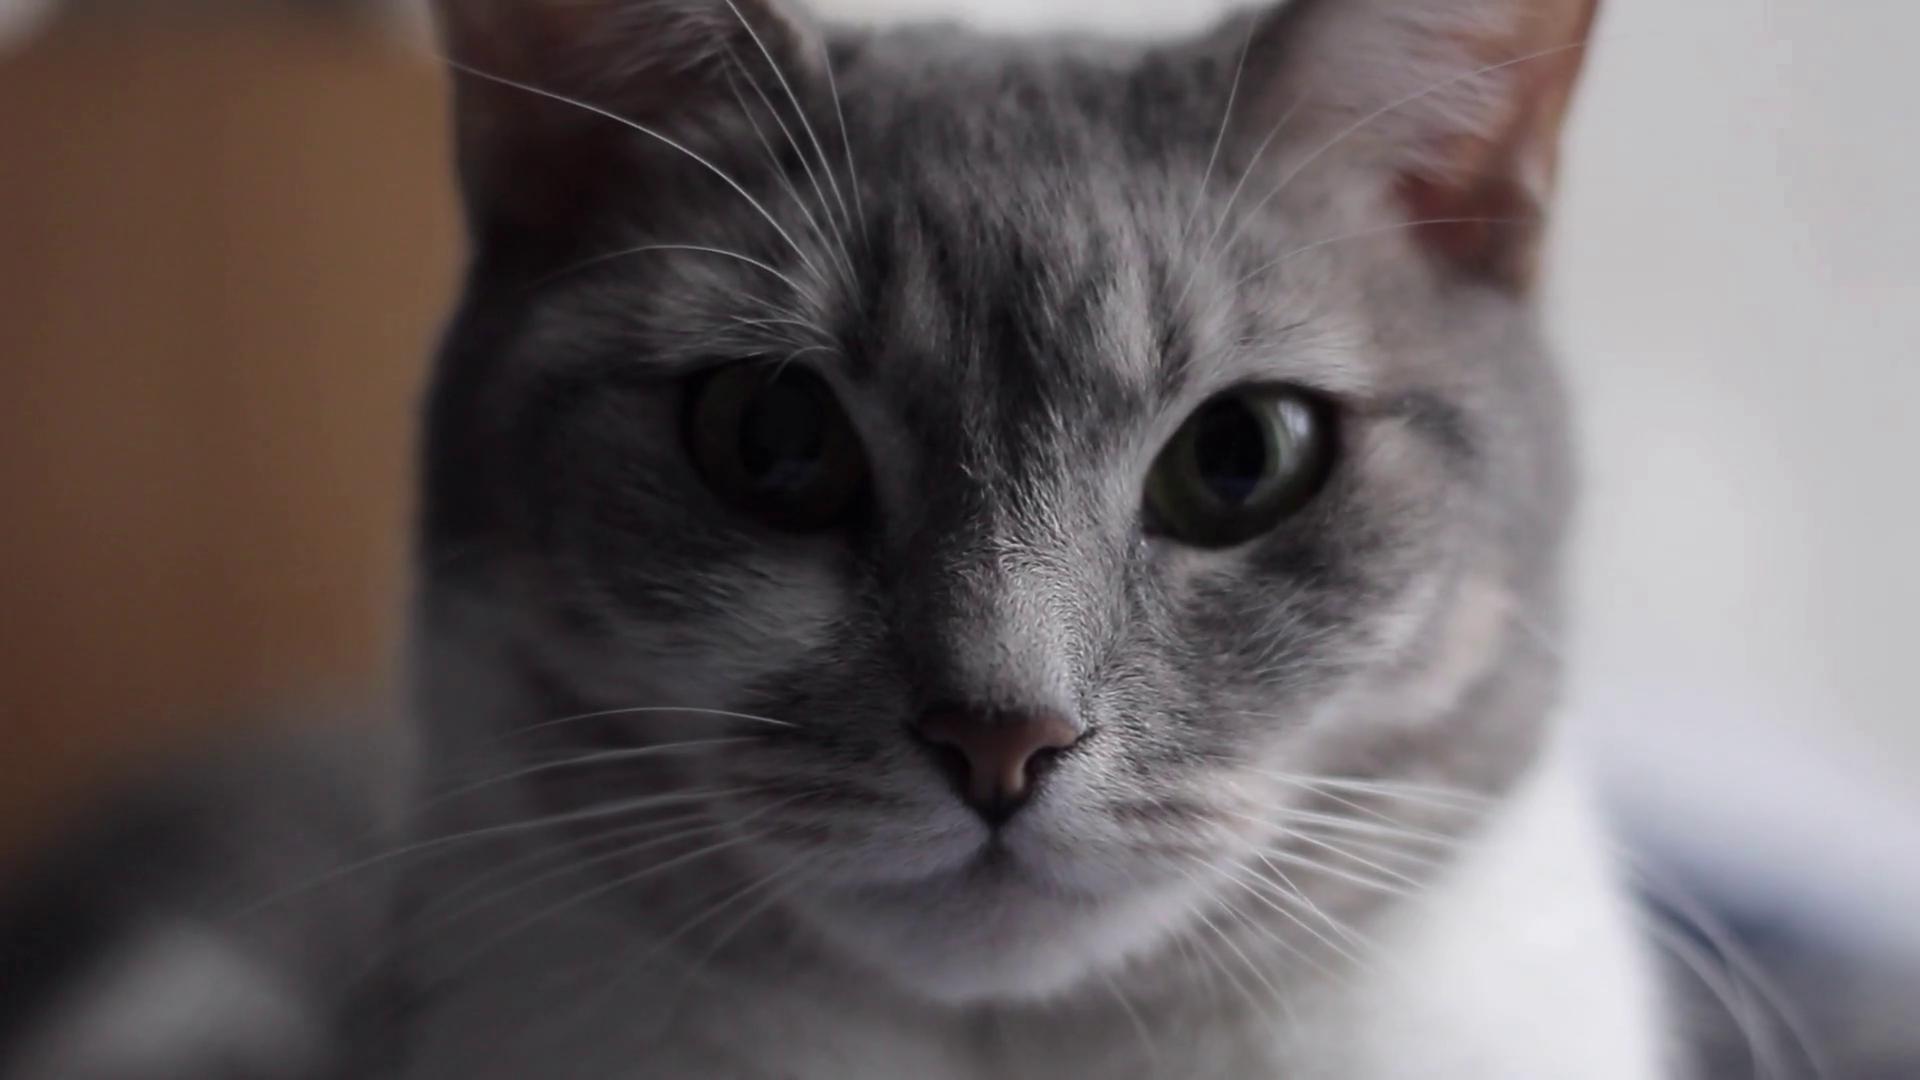 Cat Face, Closeup, Handheld Stock Video Footage - VideoBlocks